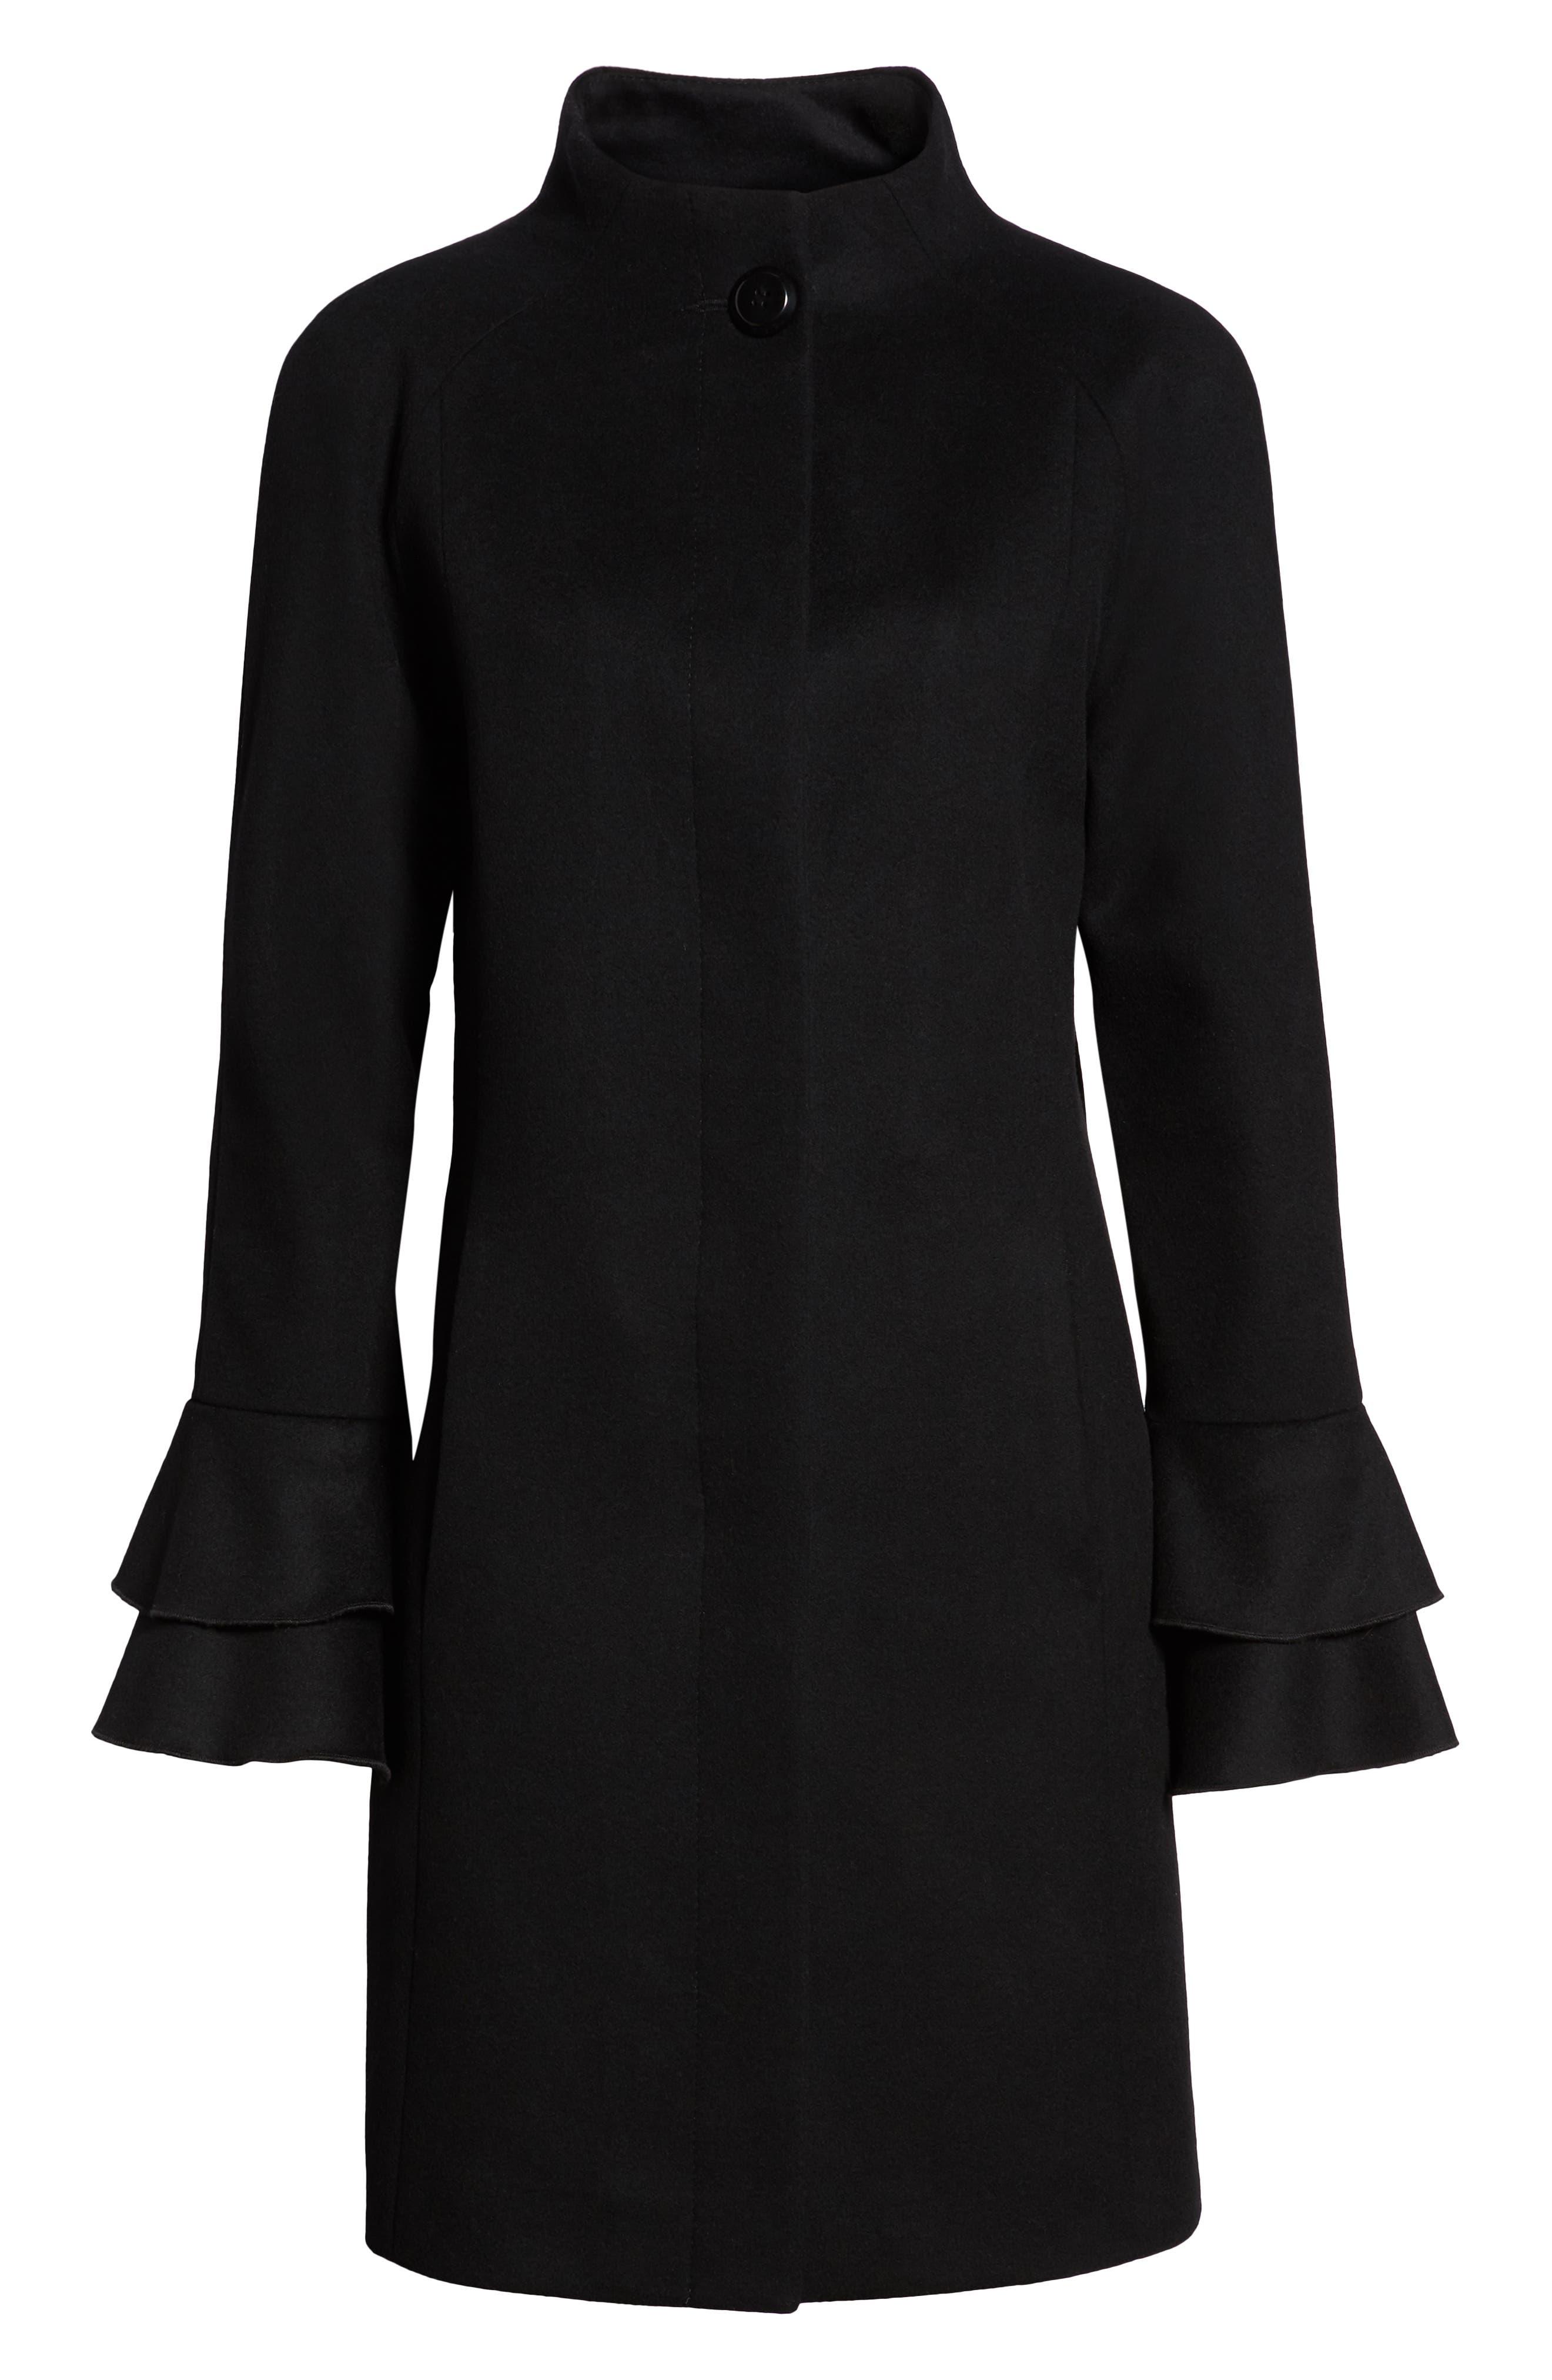 TRINA TURK,                             Sara Ruffle Cuff Wool Blend Coat,                             Alternate thumbnail 6, color,                             001